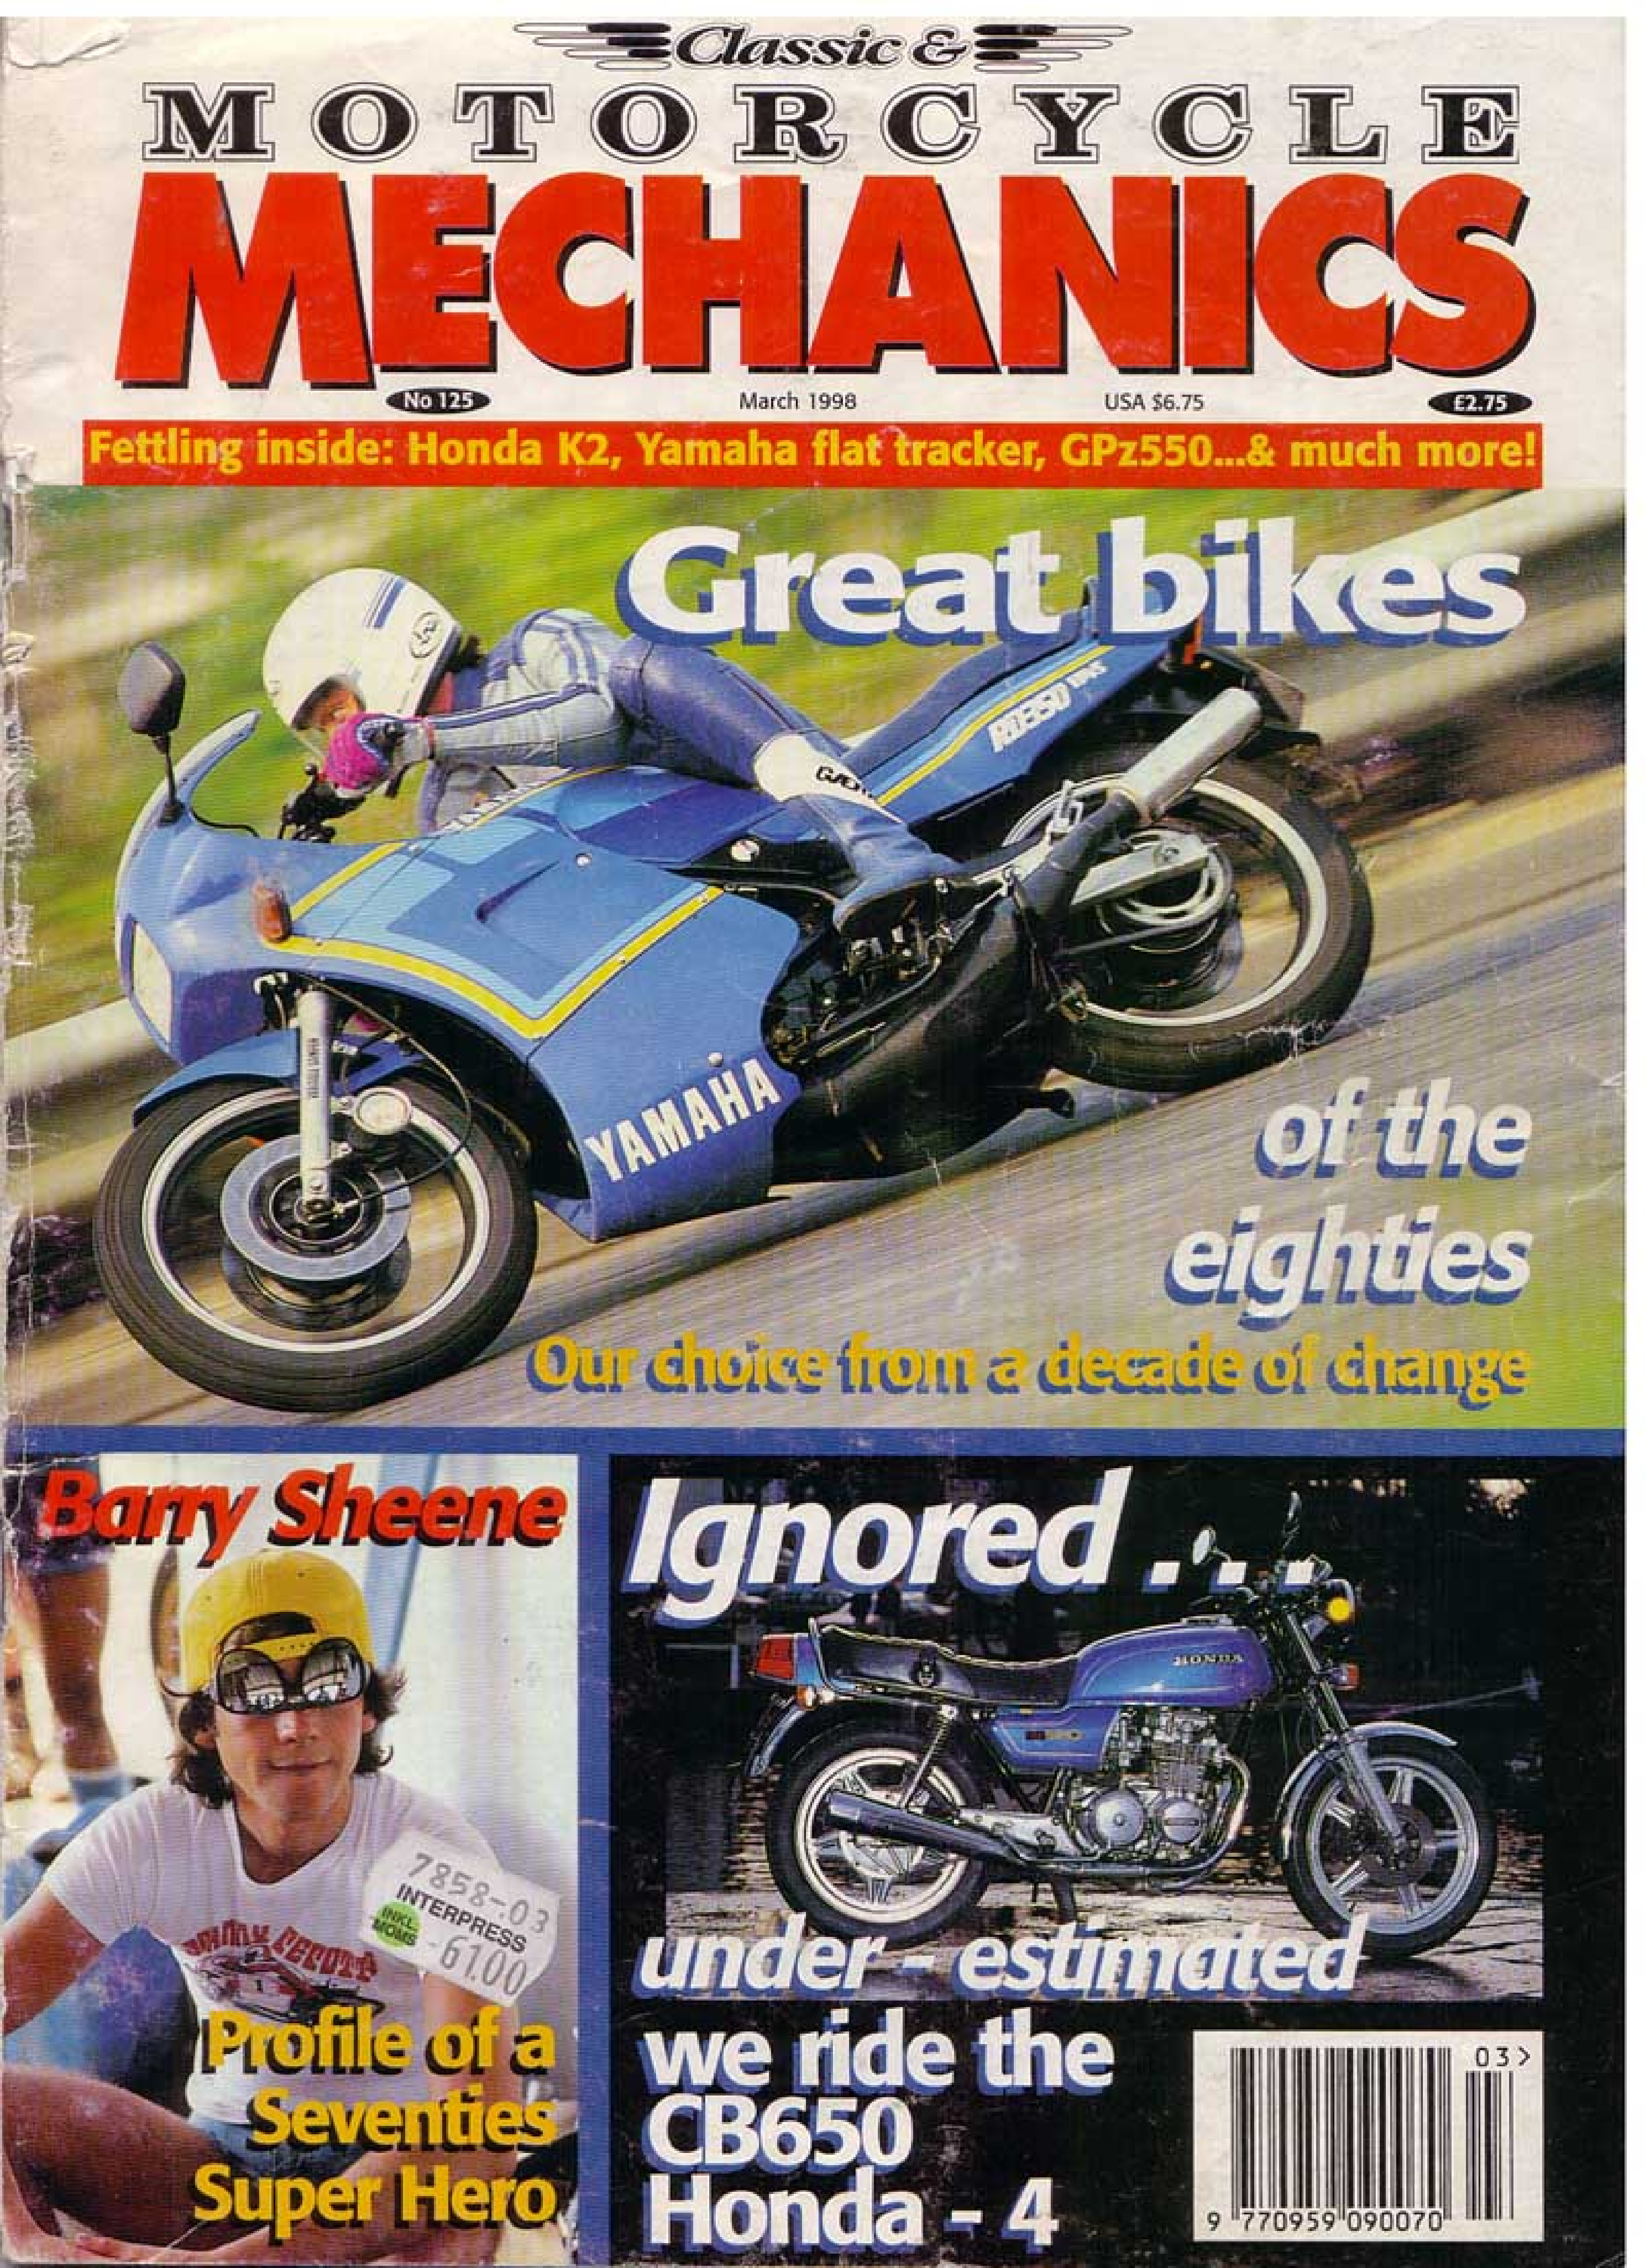 Motorcycle Mechanics about Honda CB650 (March 1988)